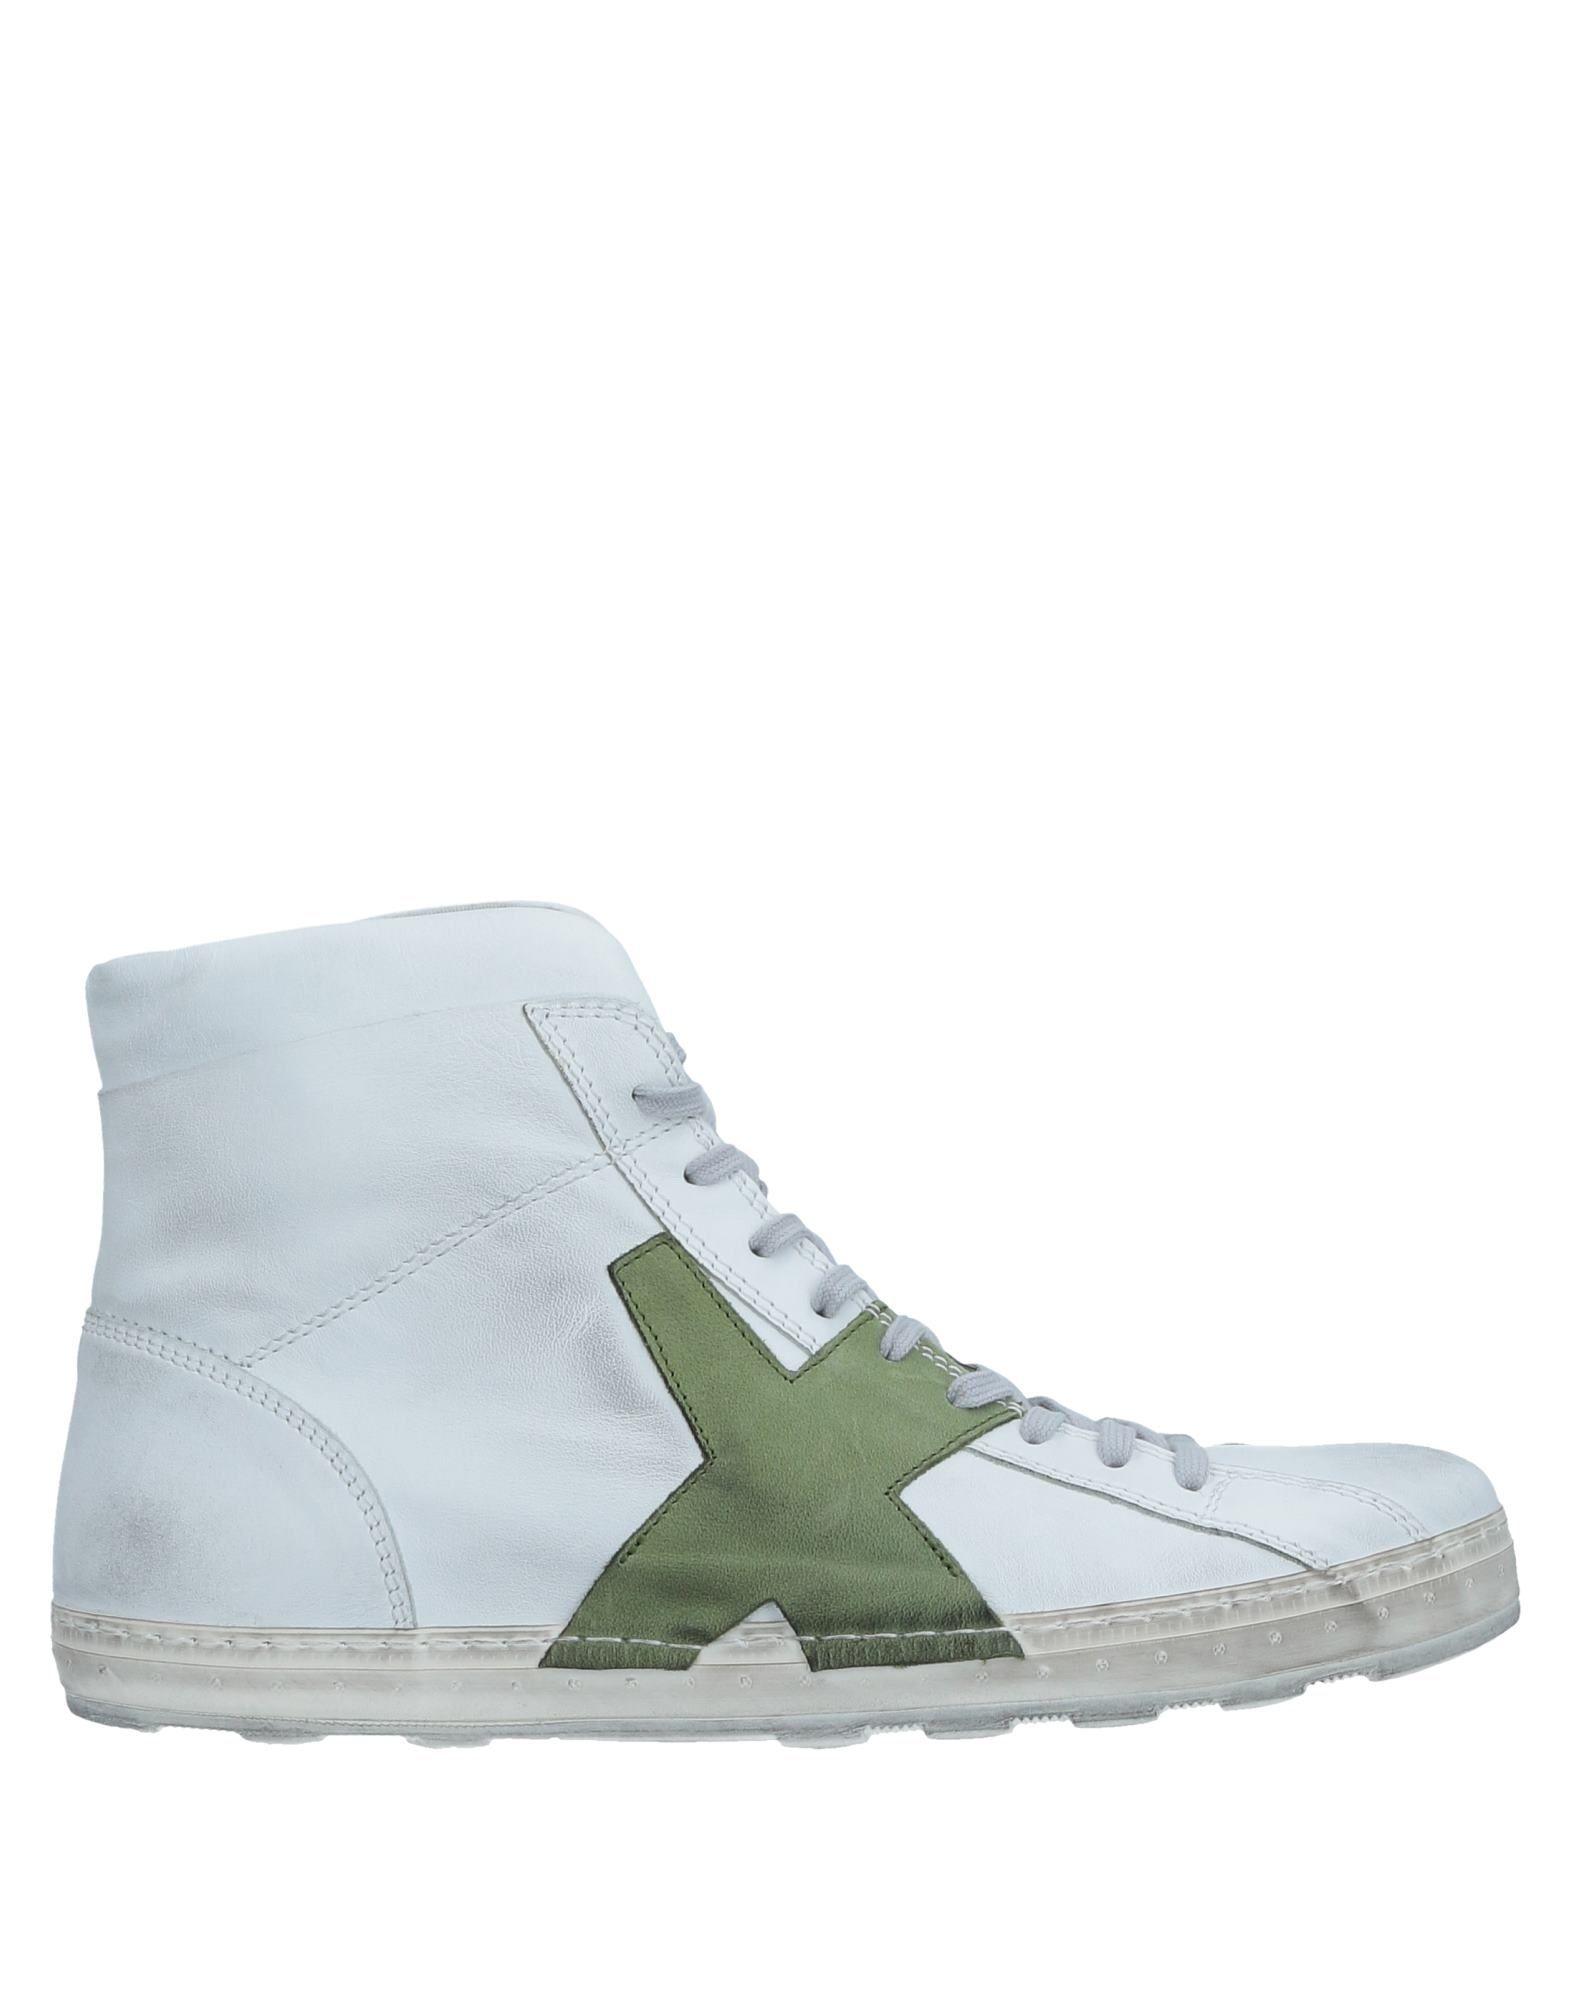 Rabatt echte Schuhe O.X.S. Sneakers 11518022CV Herren  11518022CV Sneakers a48abc